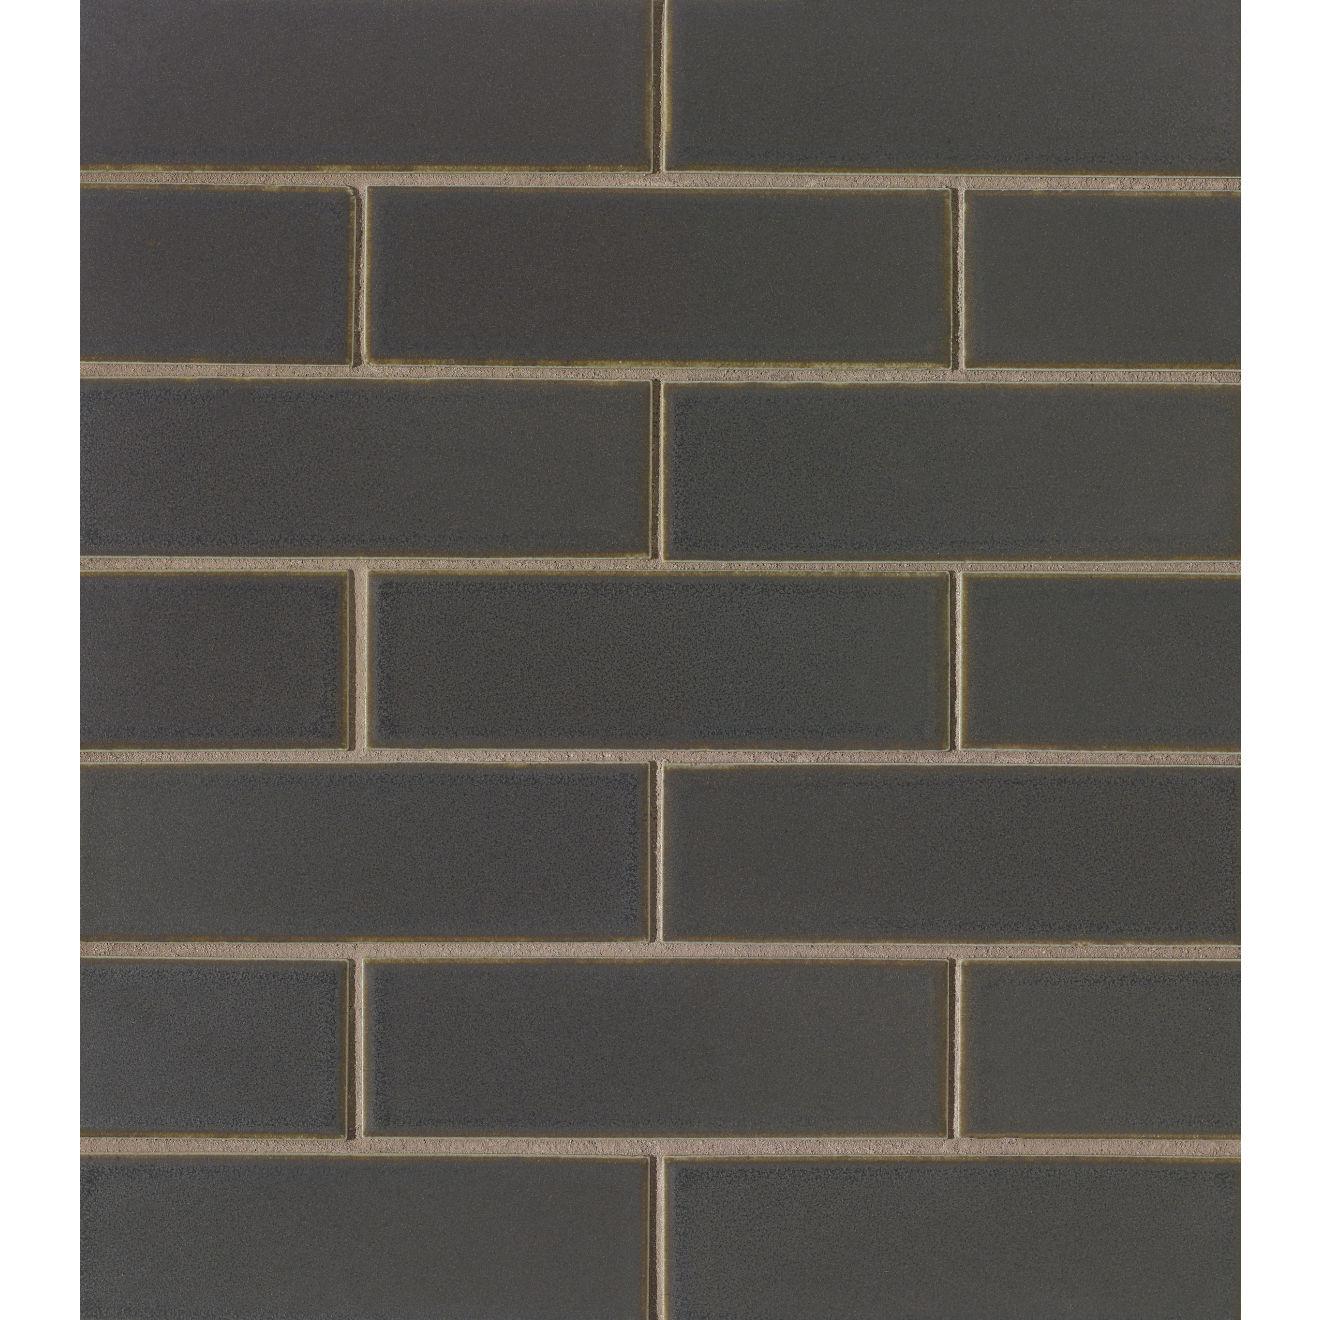 "Zenia 2"" x 6"" Matte Porcelain Floor & Wall Mosaic in Orbit"